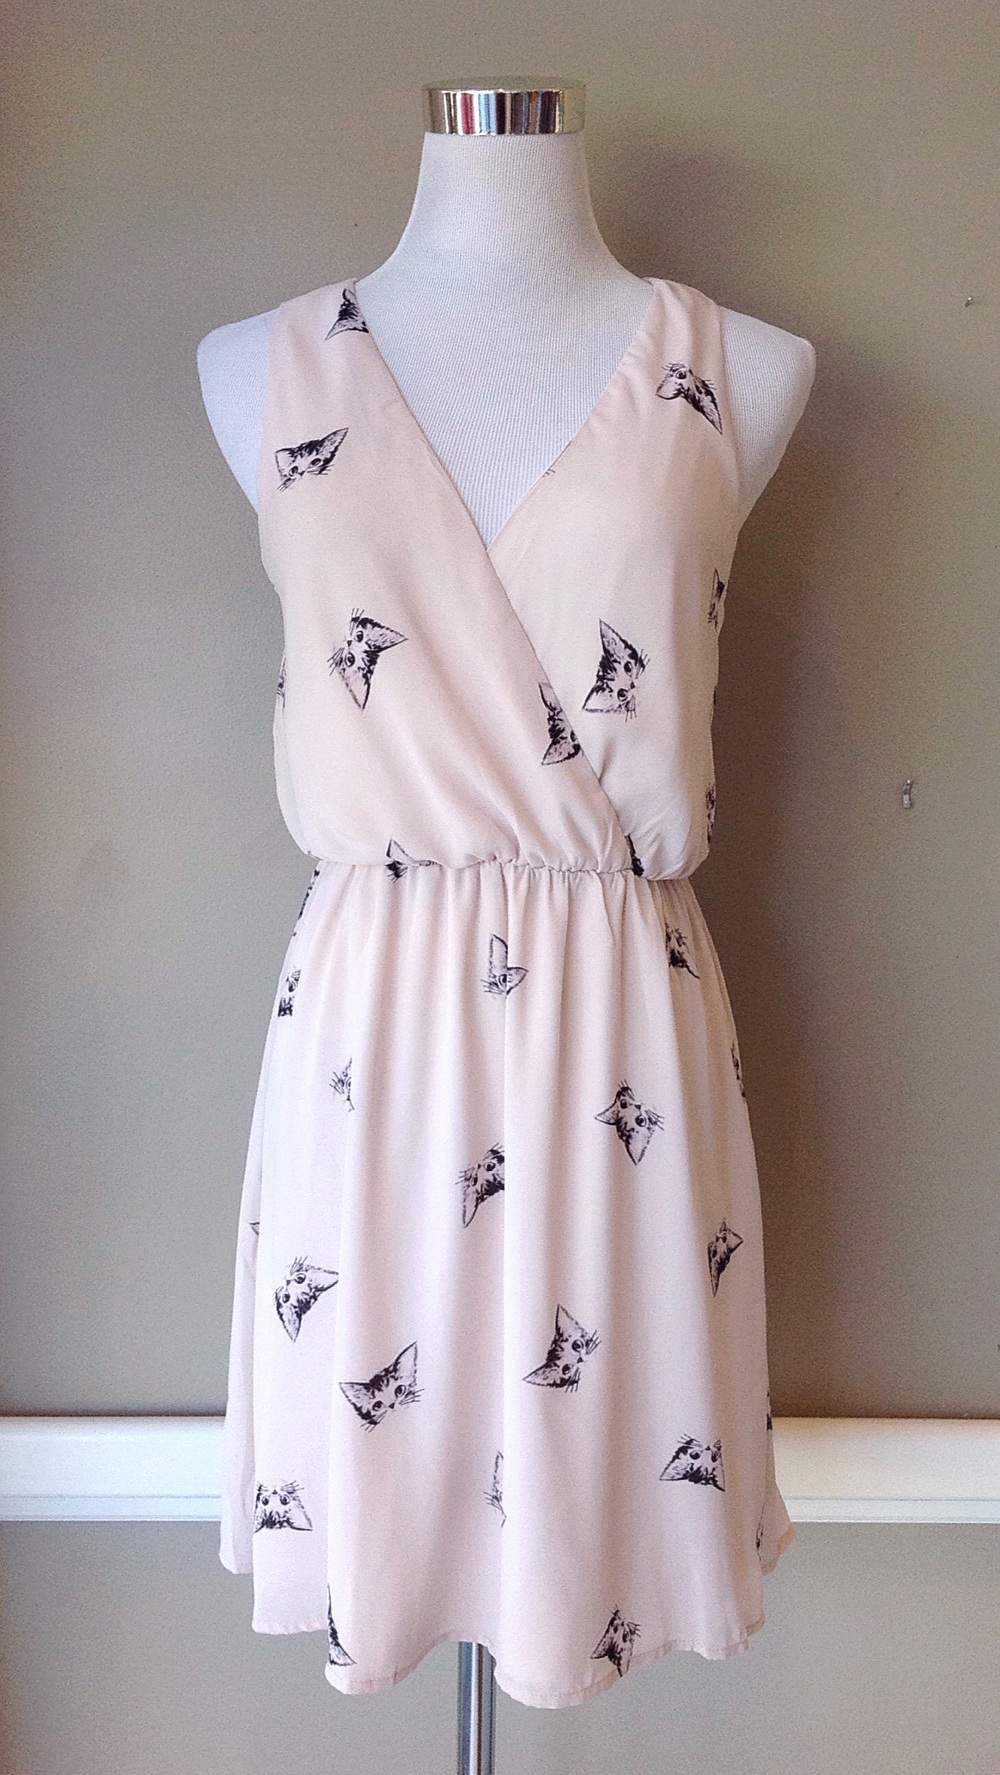 Cat print dress, $45